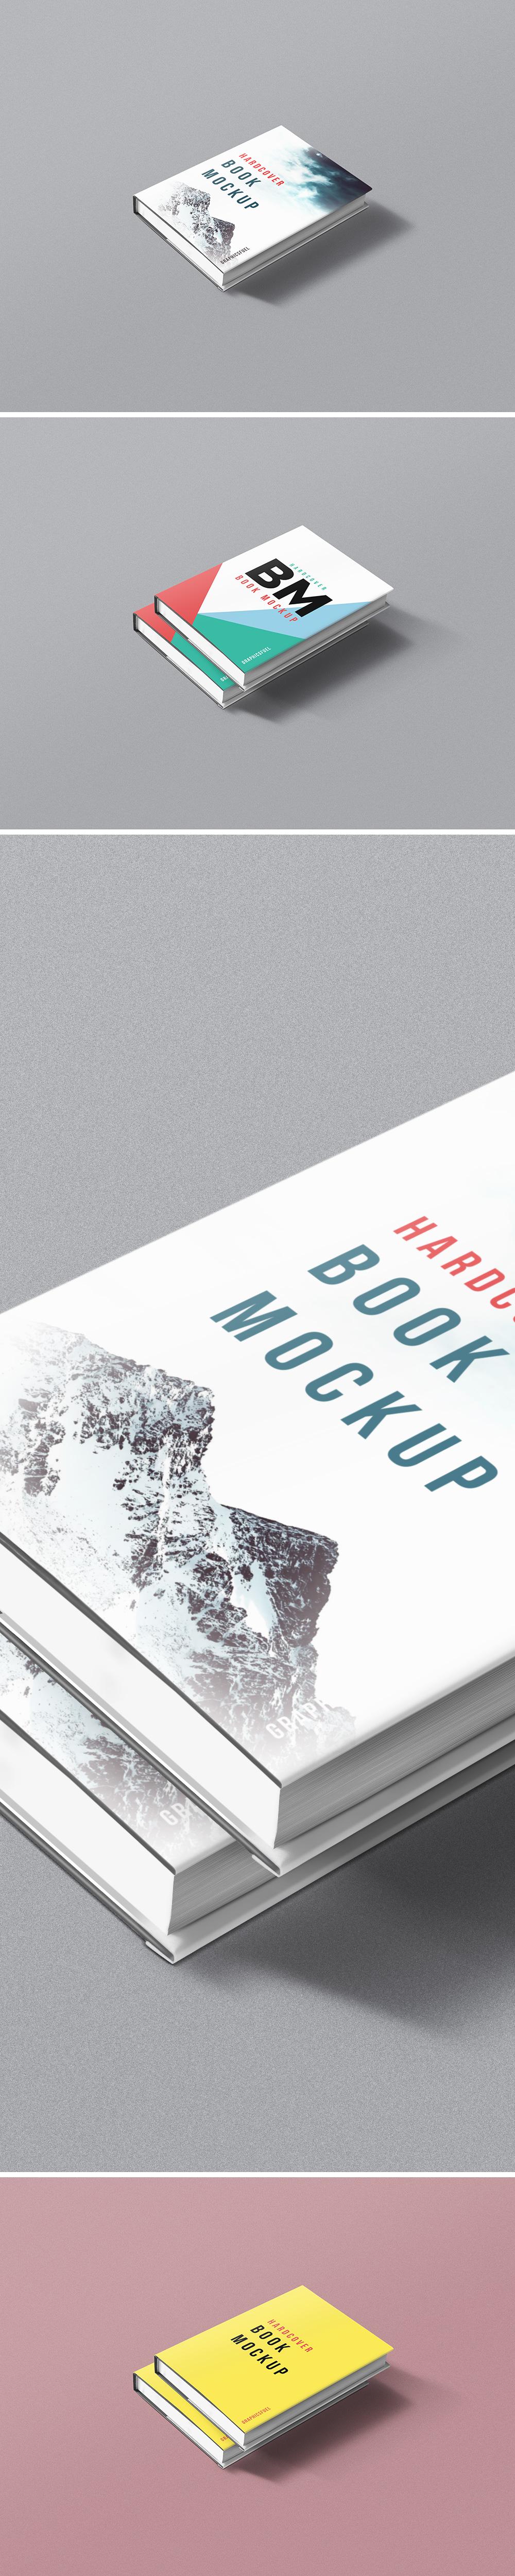 Hardcover Book Mockup PSD